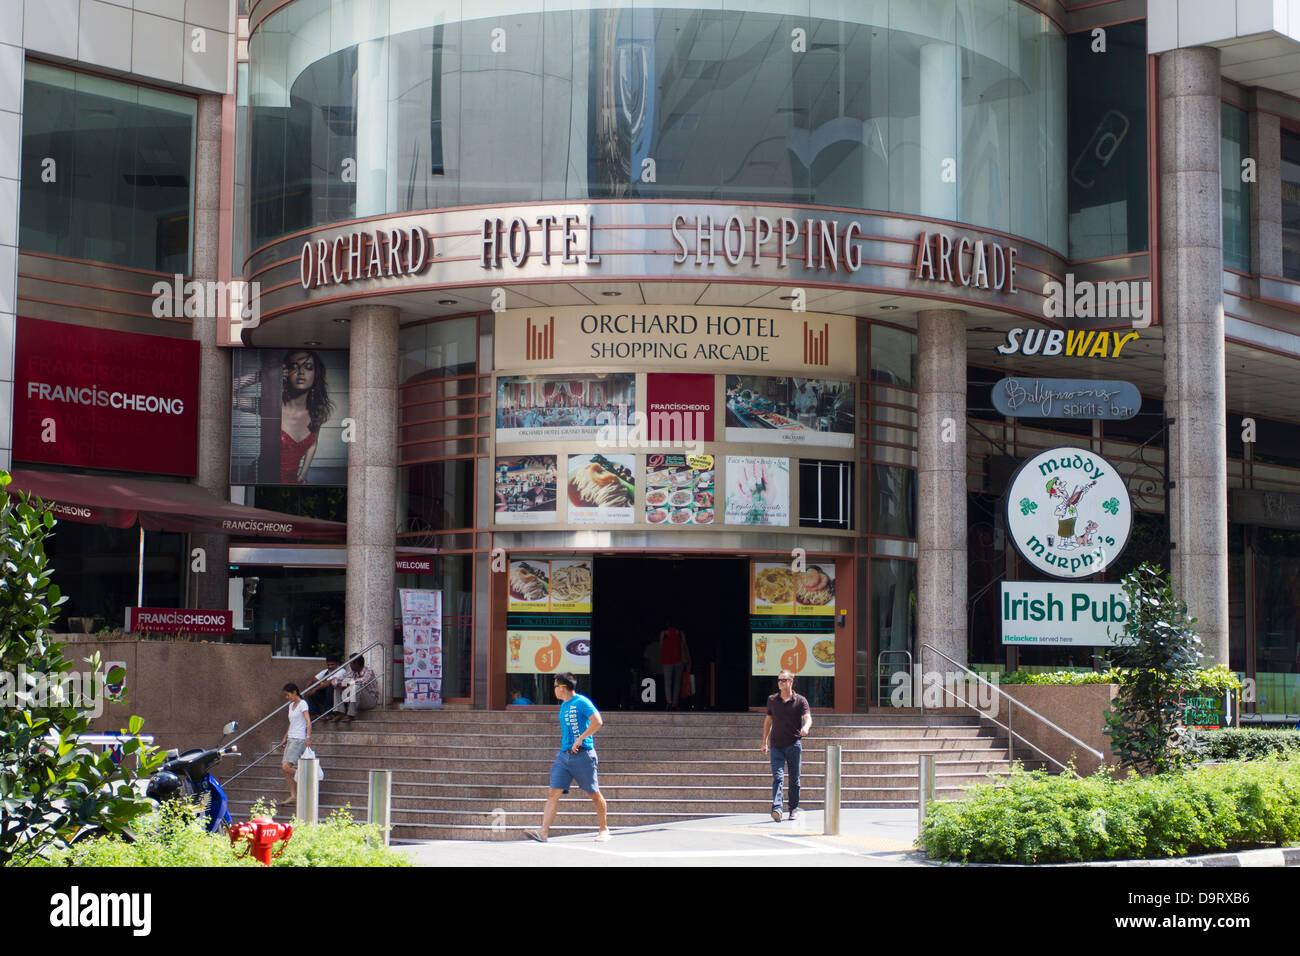 Orchard hotel shopping arcade, Orchard Road, Singapore, Asia - Stock Image